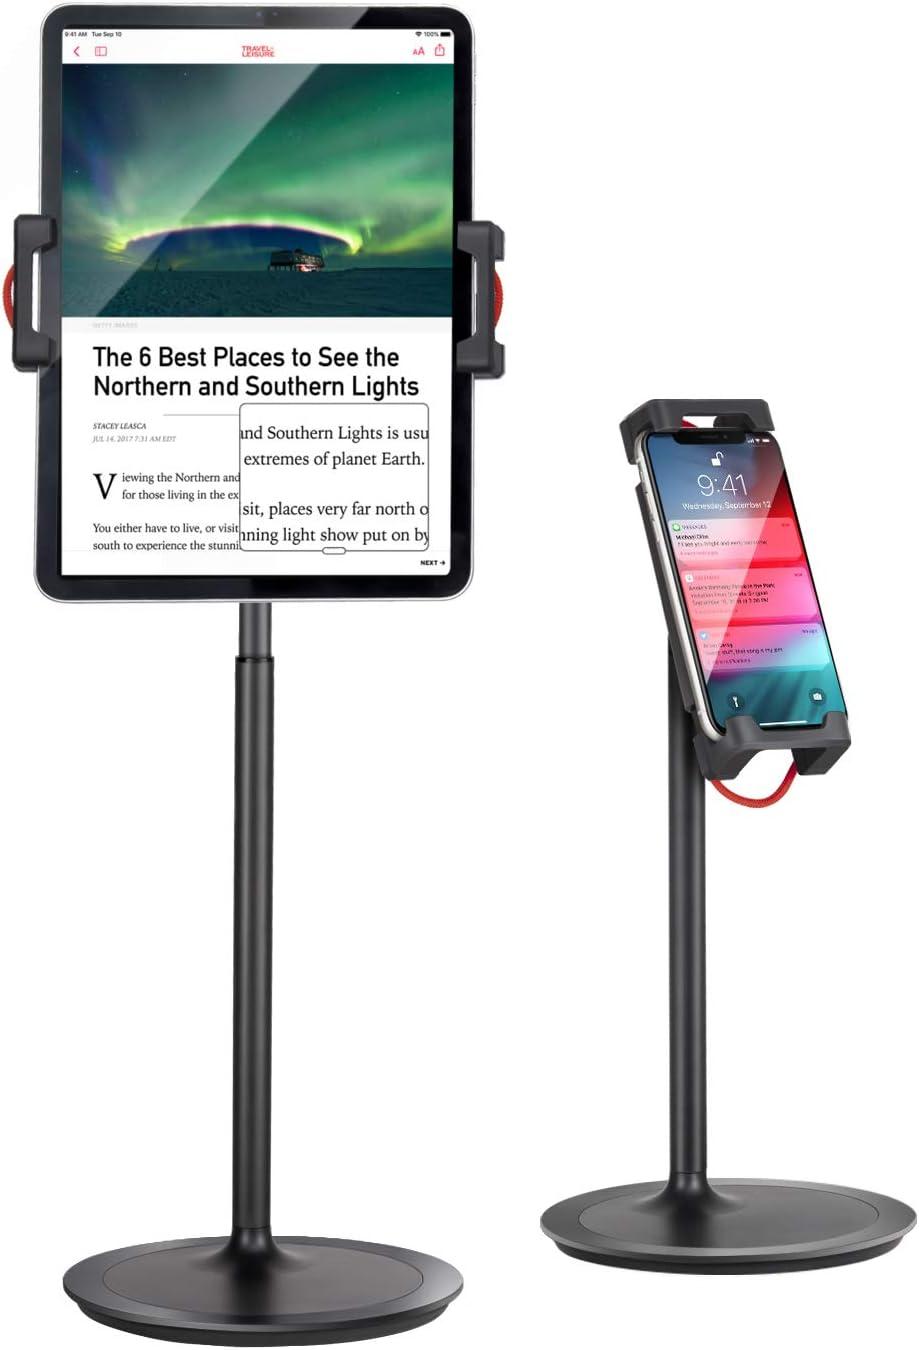 "Tablet Ipad Stand Holder, SAIJI Adjustable Phone Stand, 360 Degree Rotating, Aluminum Alloy Cradle Desktop Holder Dock for 4.7""-12.9"" Screen Phones, iPad, Nintendo Switch, Kindle, eBook Reader (Black)"